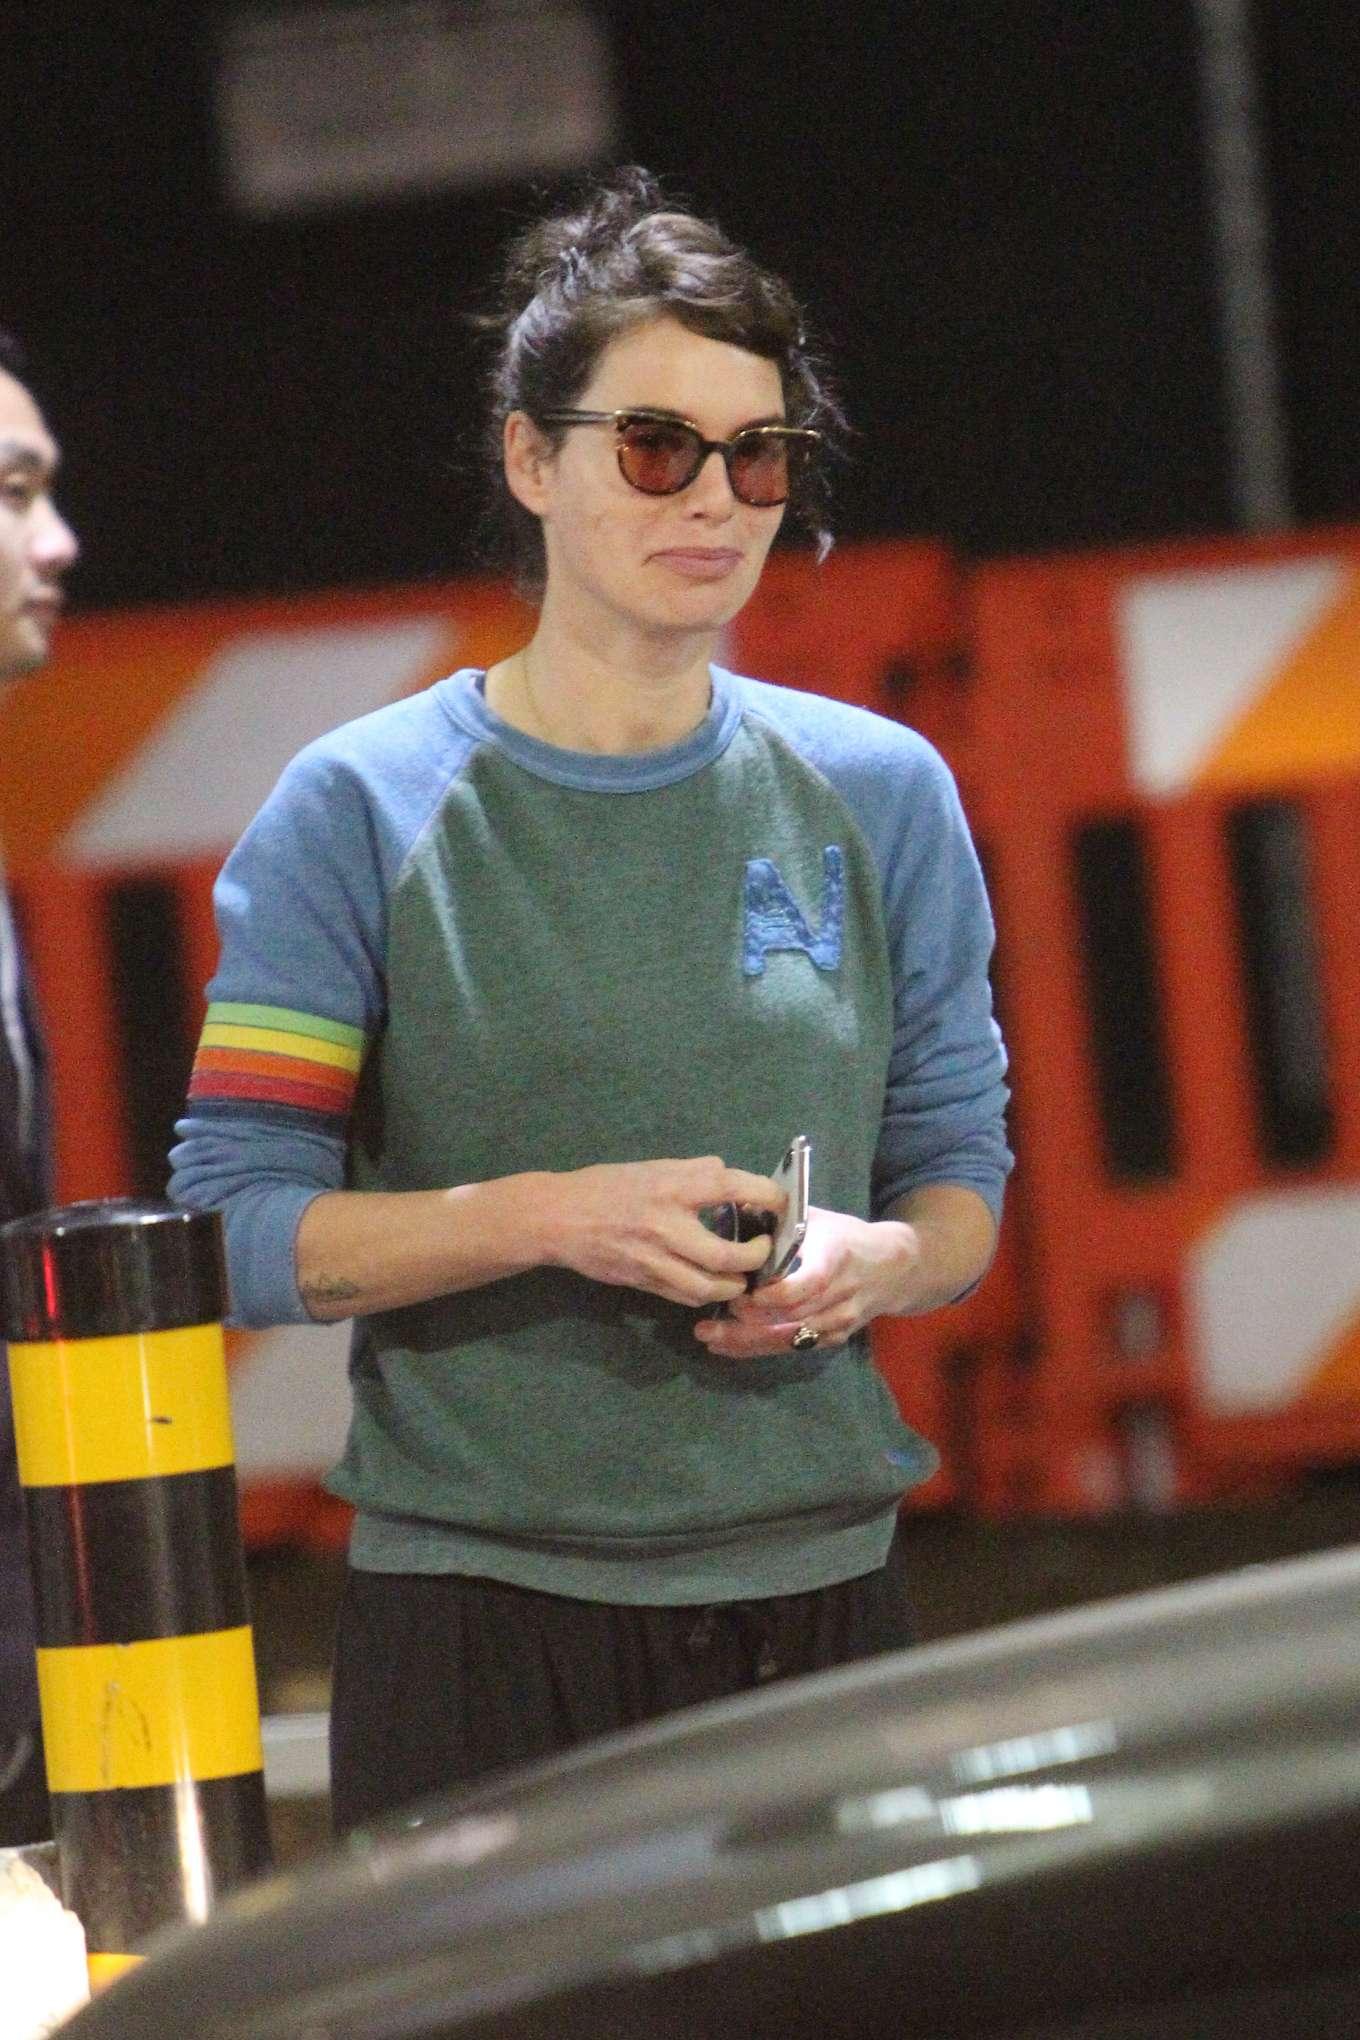 Lena Headey - Arriving at LAX airport in LA